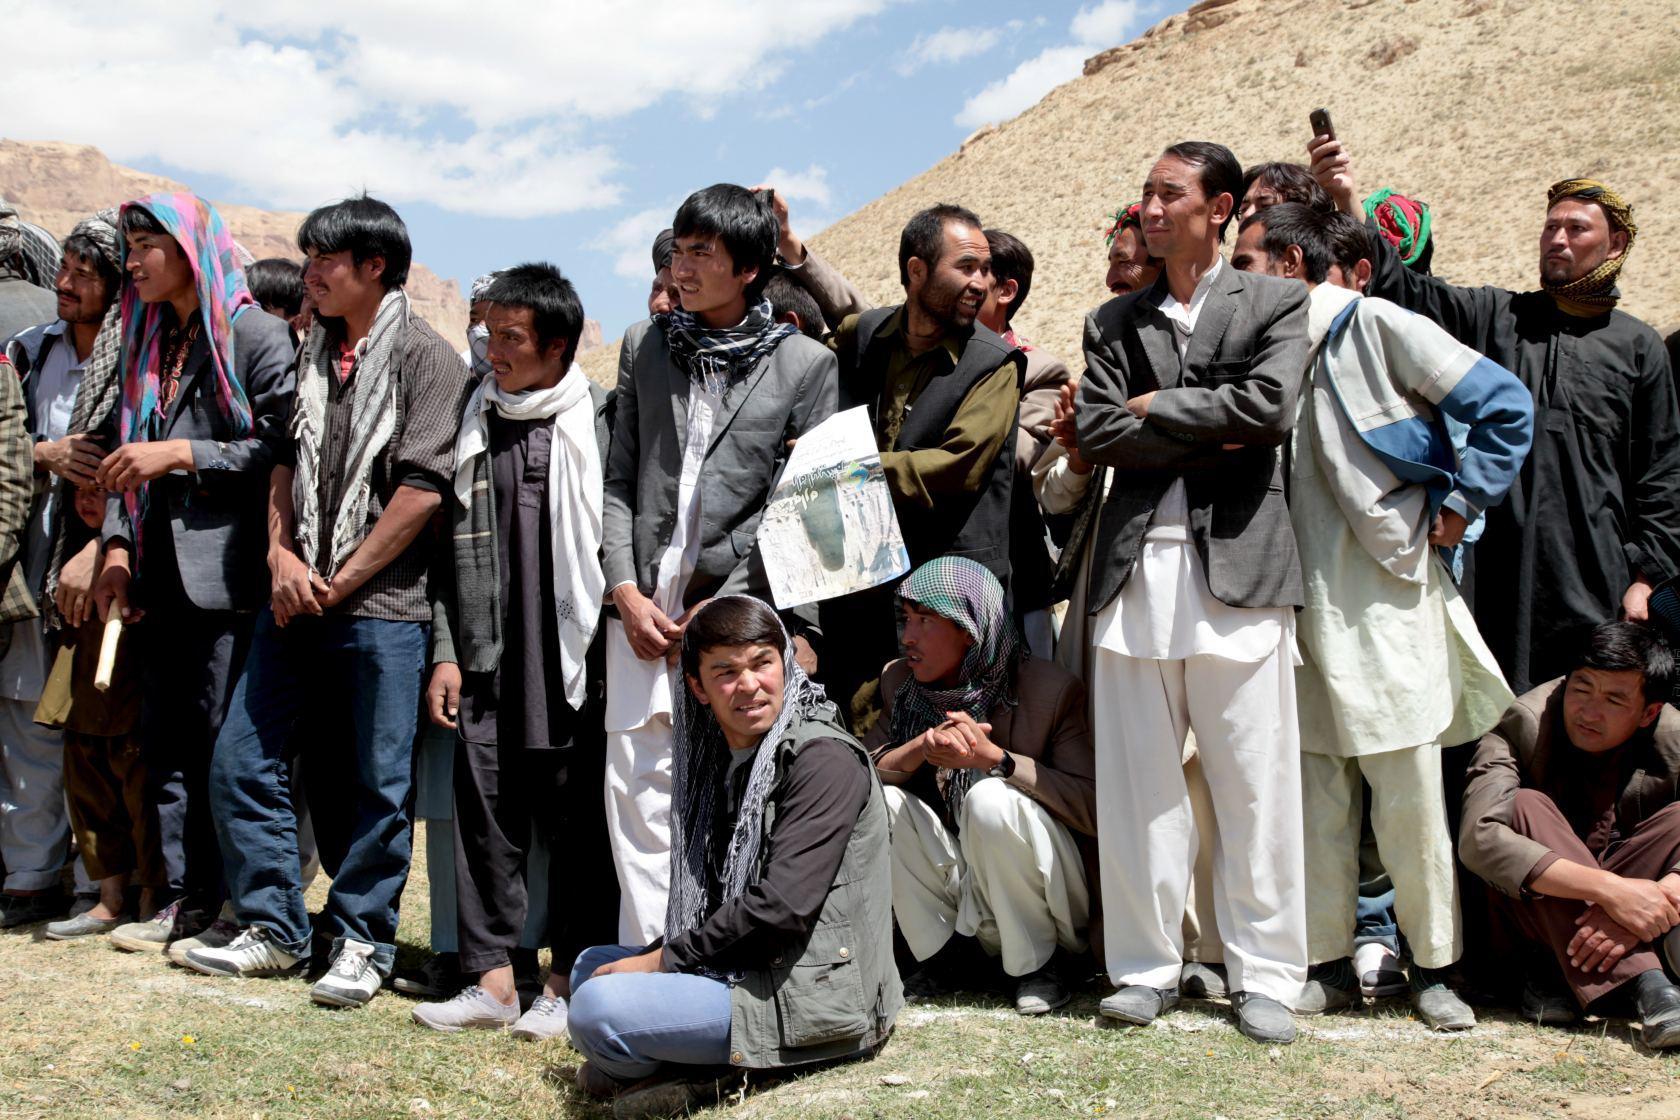 bamiyan-afghanistan-ulyces-04